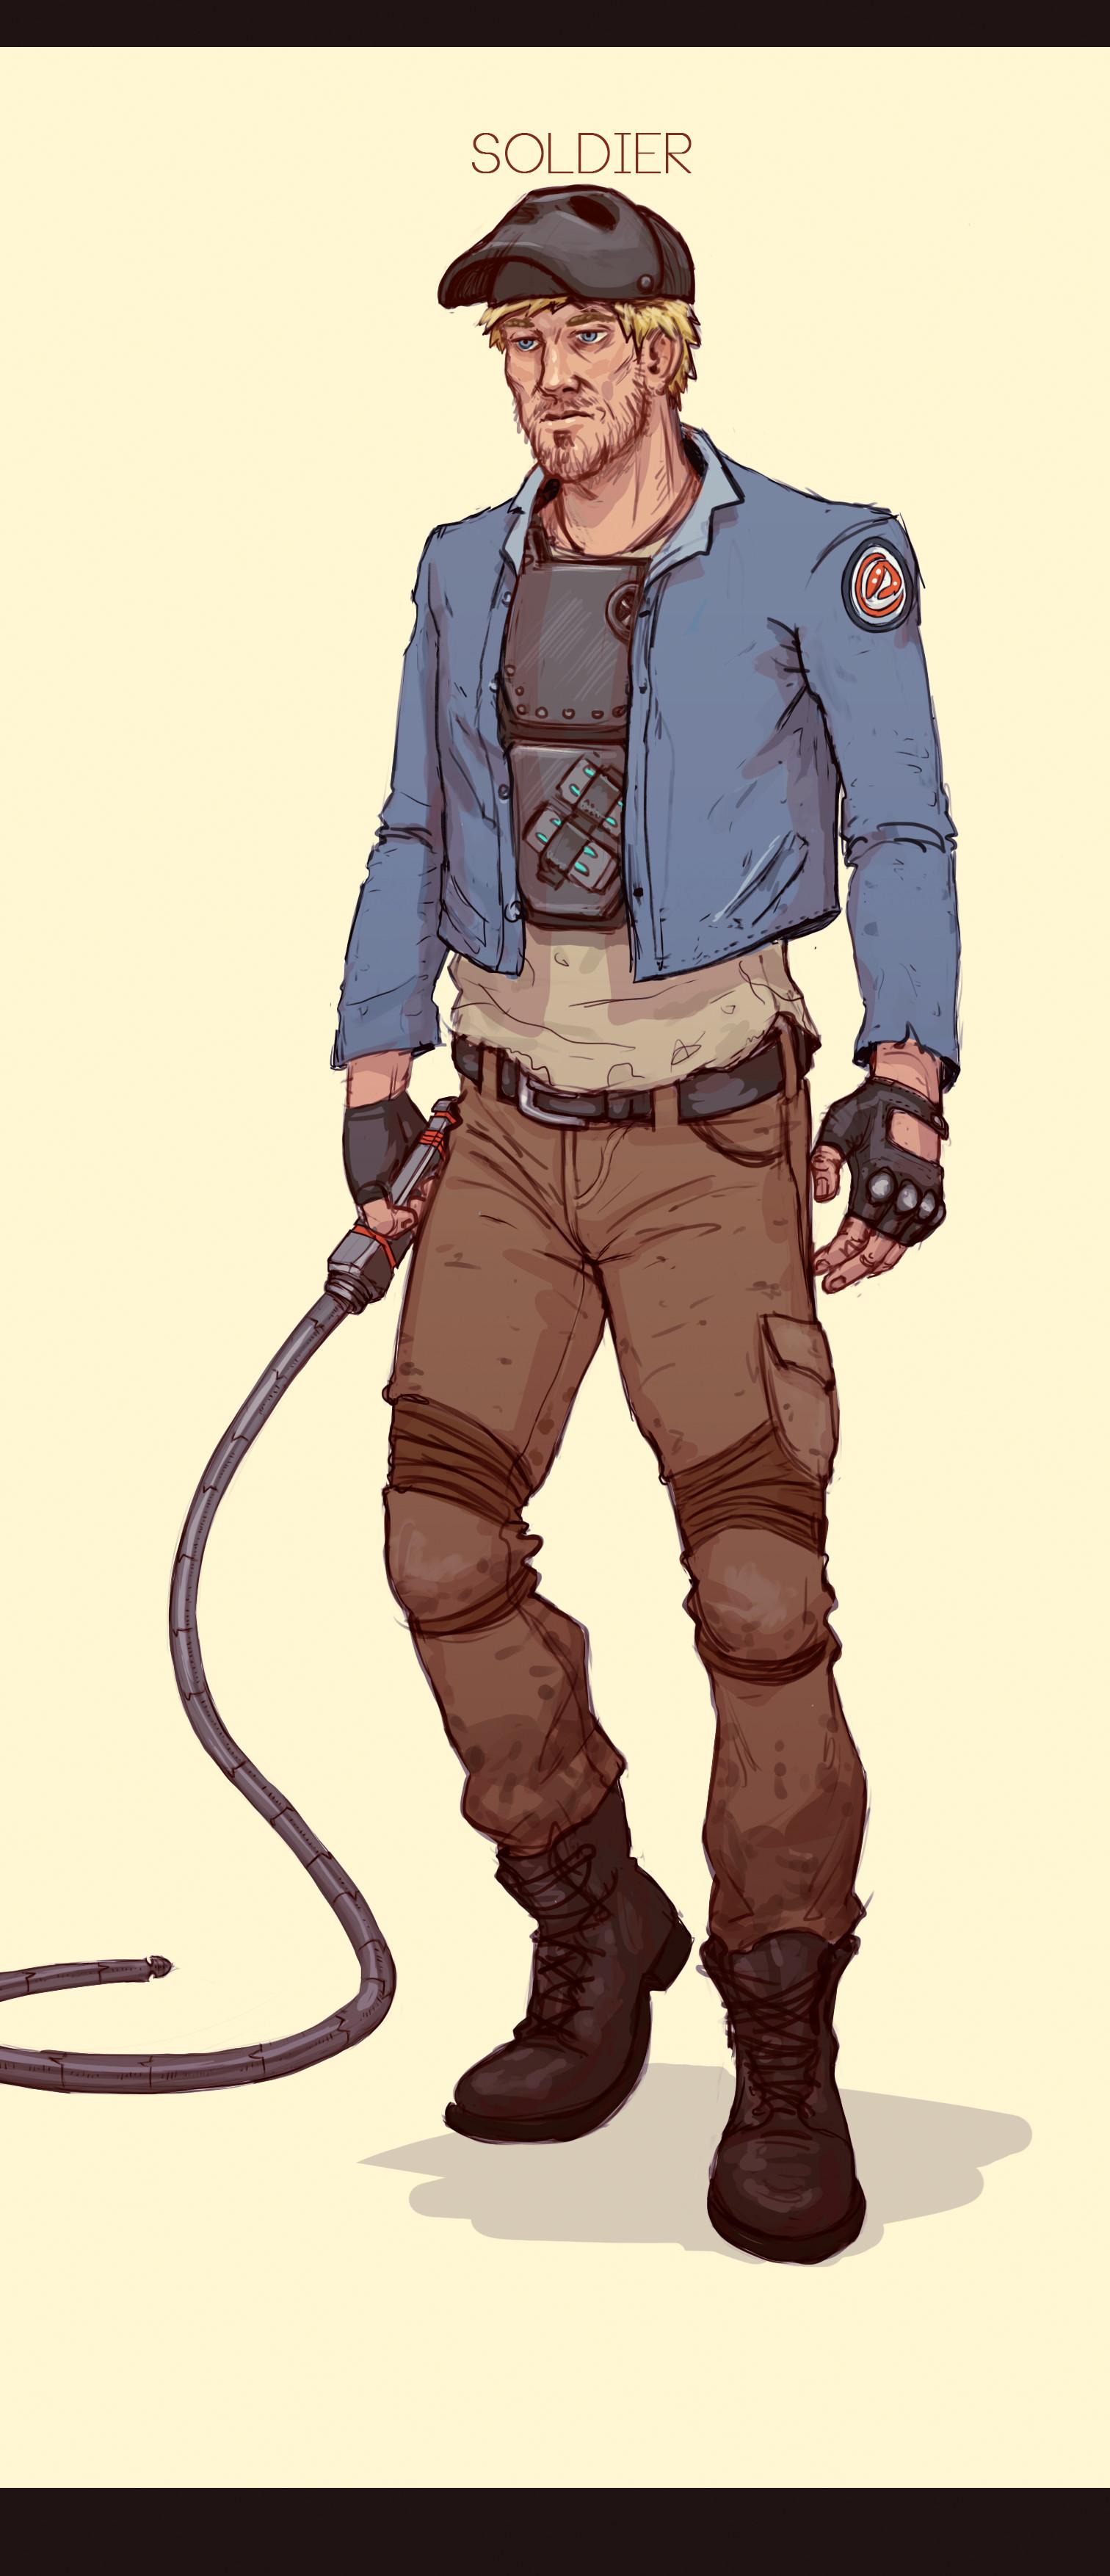 Jean philippe hugonnet soldier